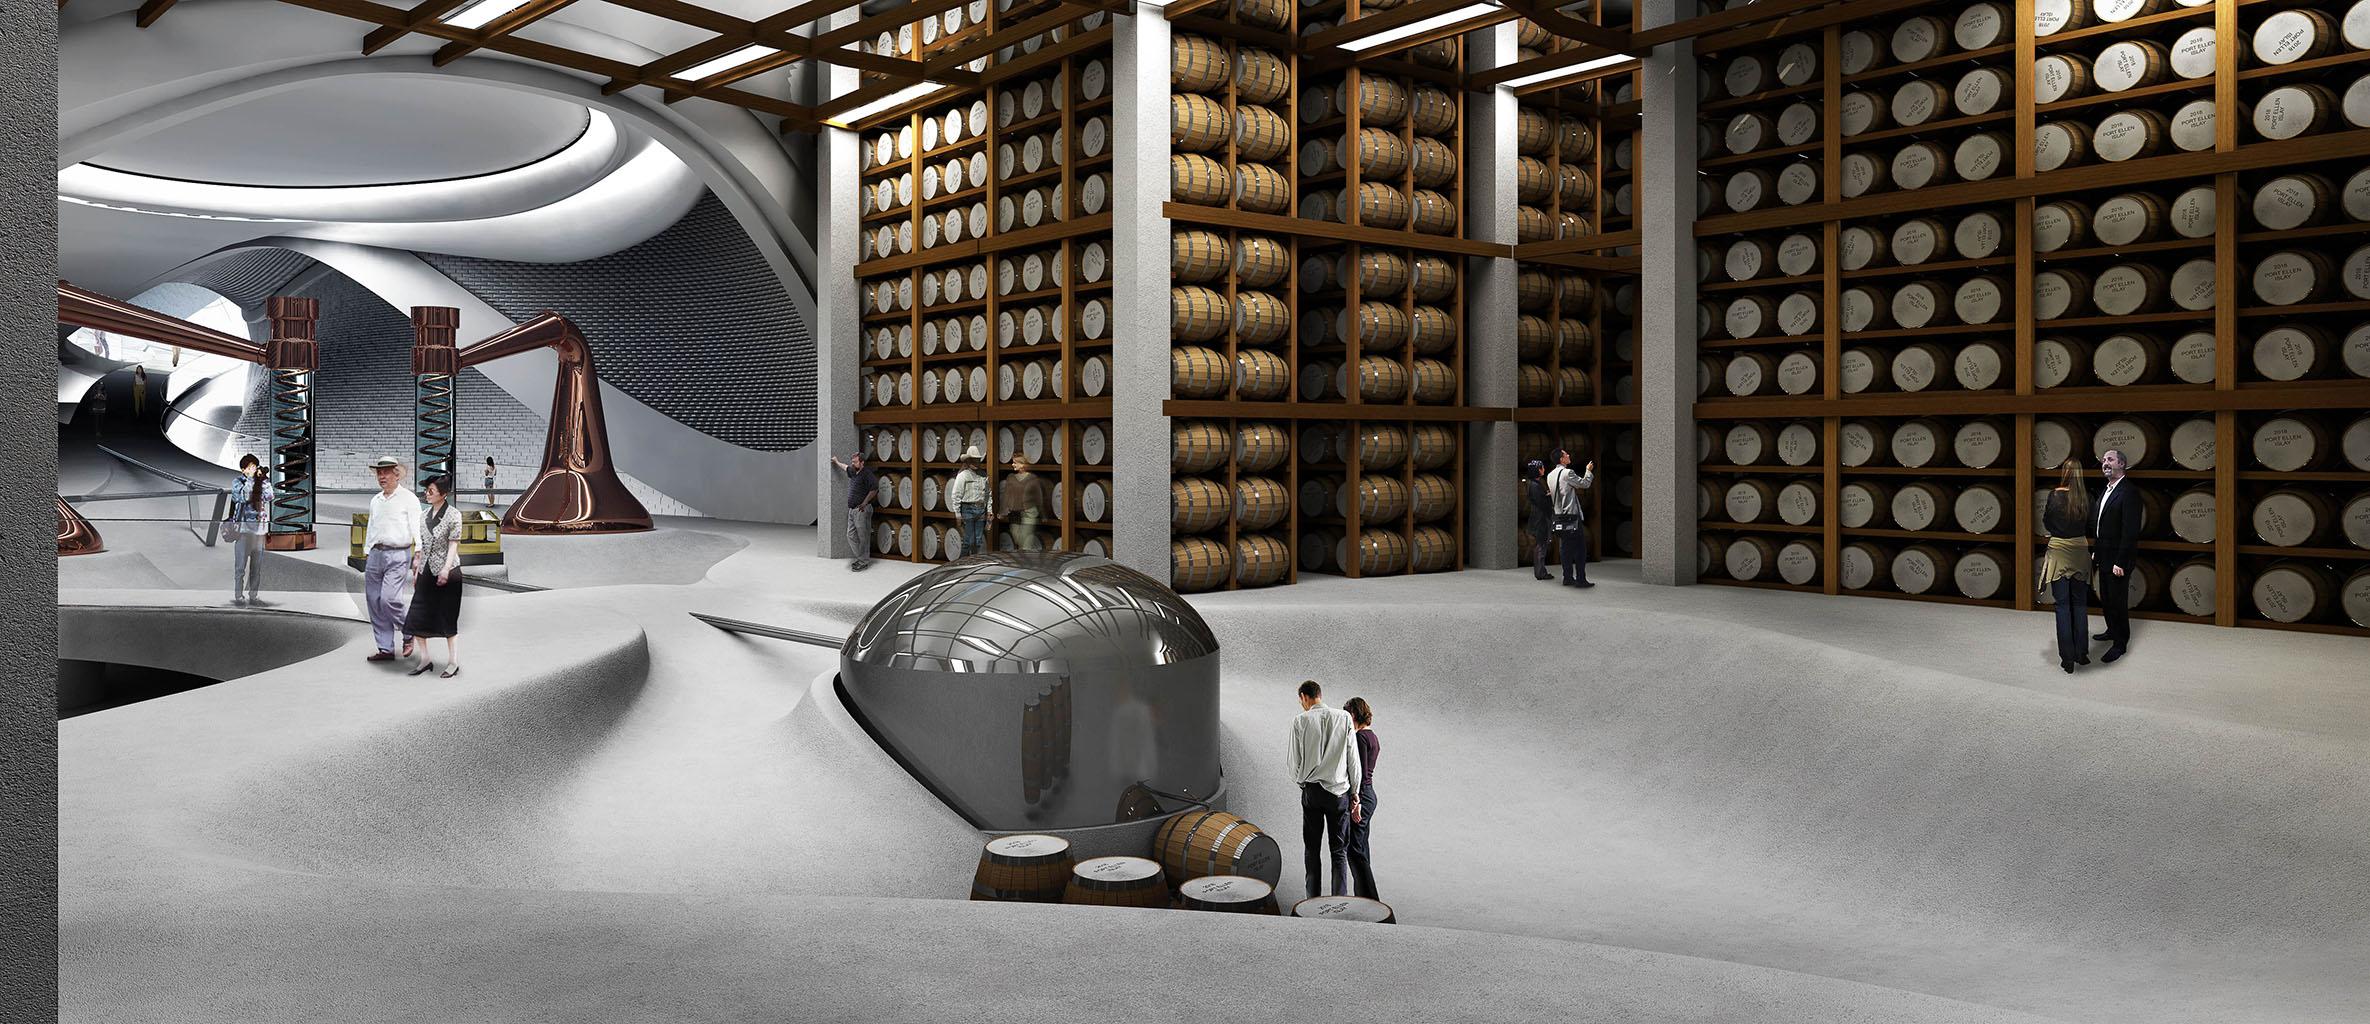 Storage - Port Ellen Distillery - e Bléck architects - Philippe Grotenrath